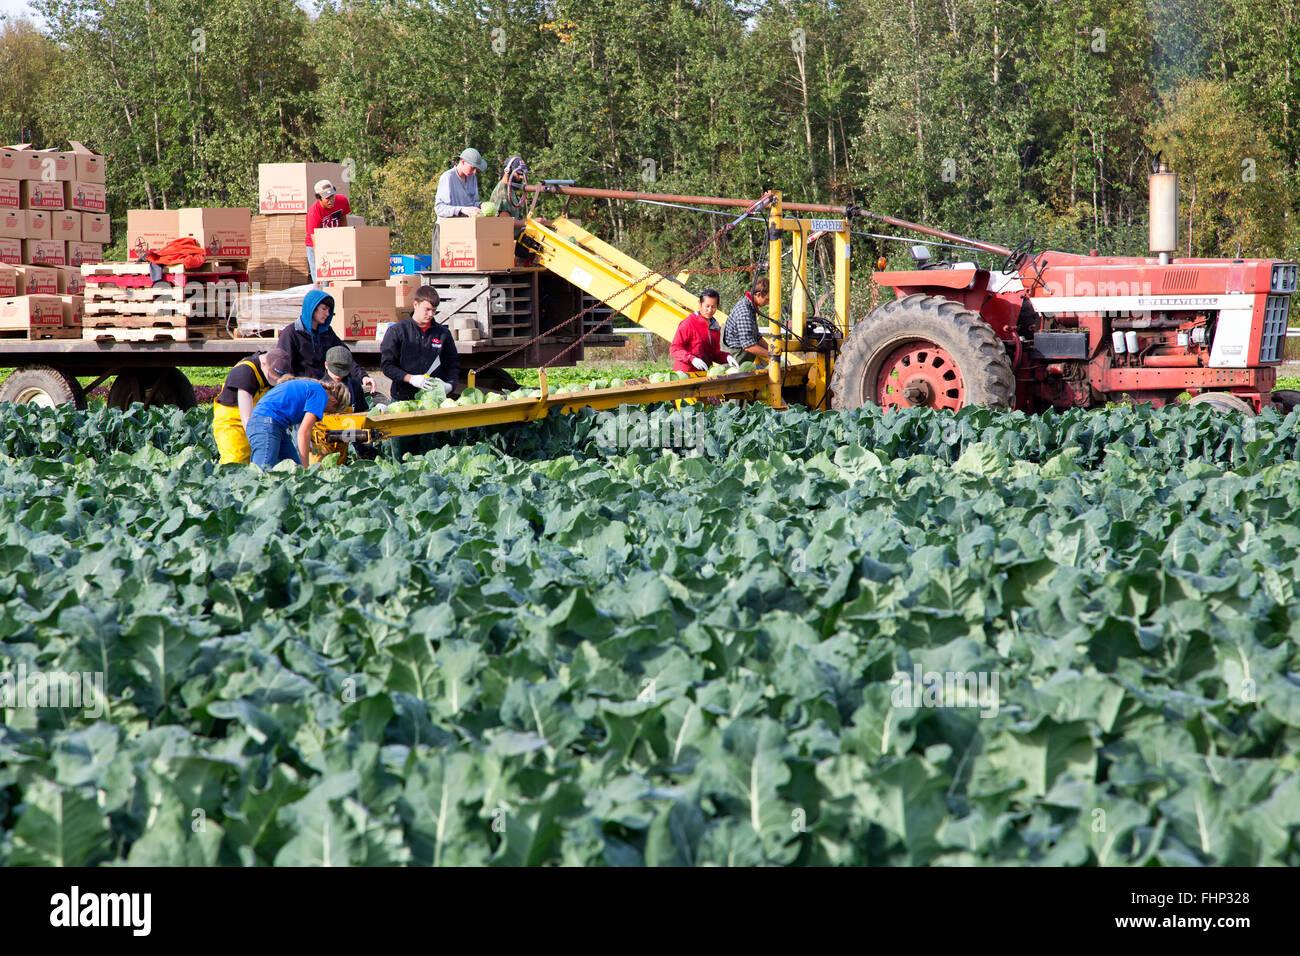 Farm workers harvesting cabbage 'Brassica oleracea', International Tractor pulling conveyor & trailer. - Stock Image